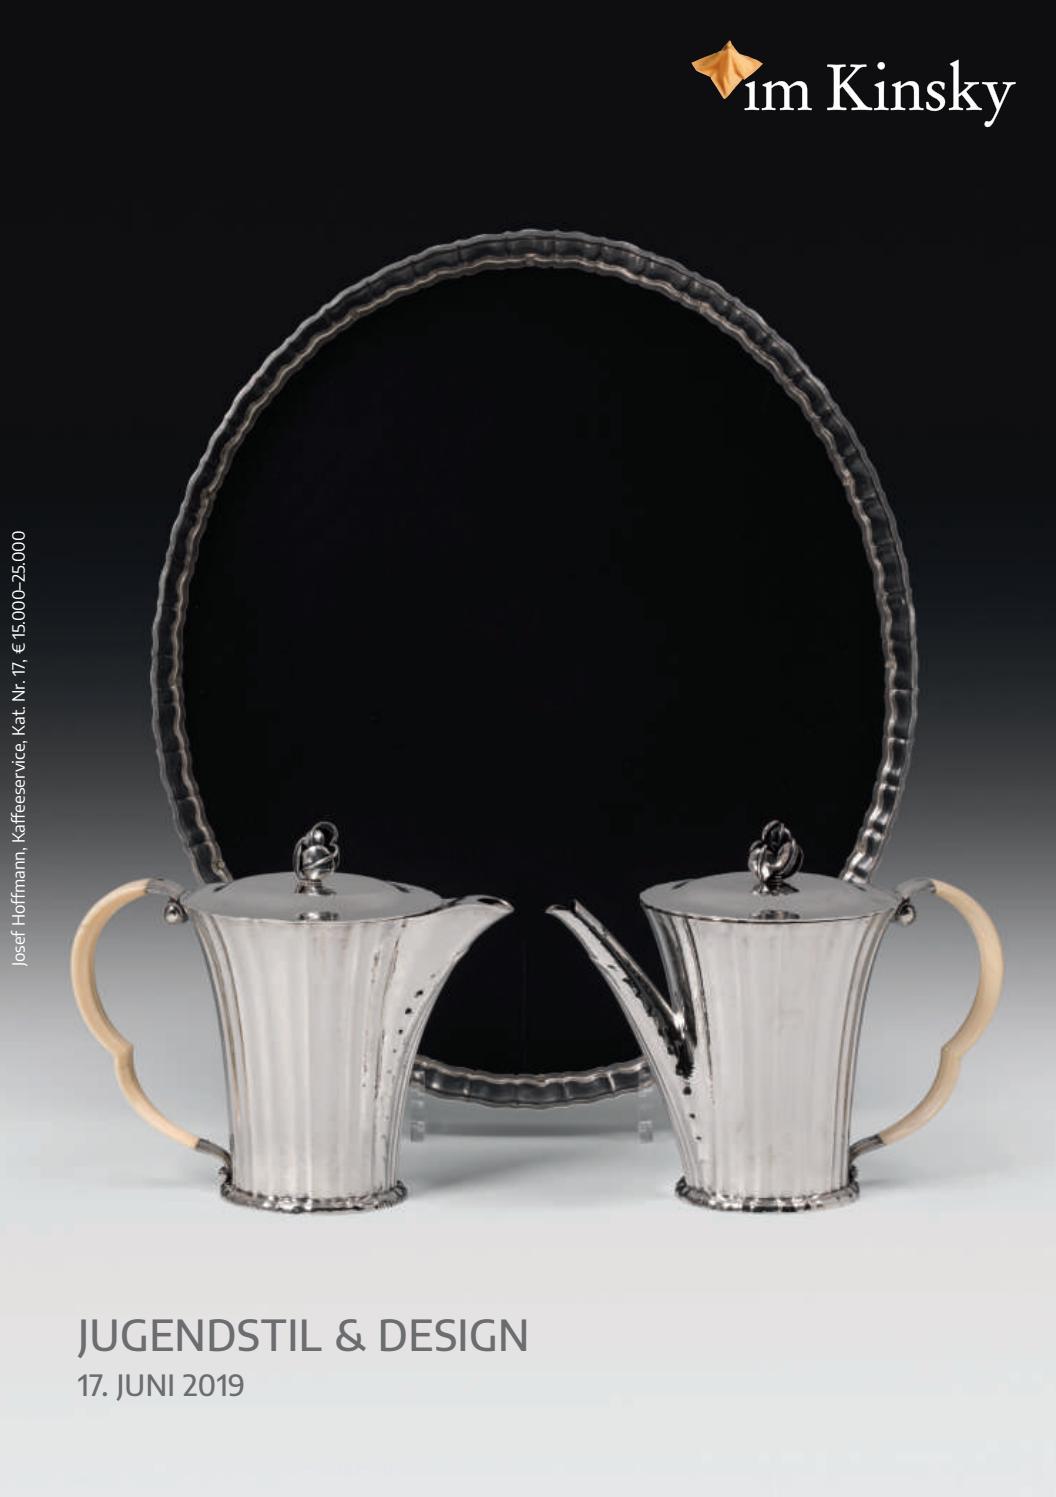 Untertasse 15,5 cm  Atelier schwarz Thomas Porzellan